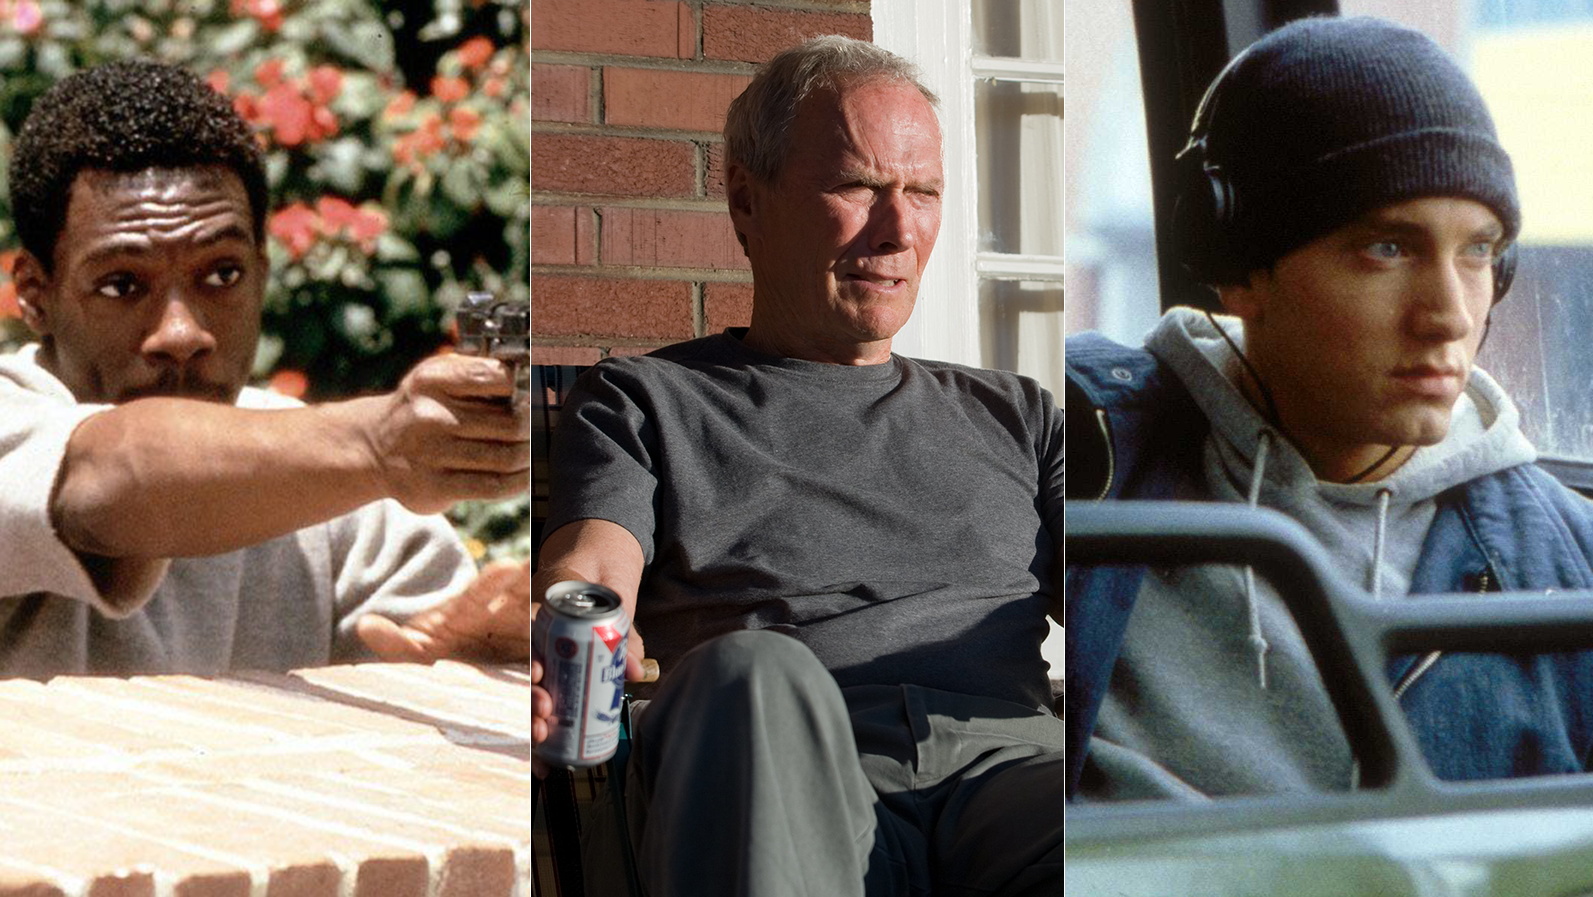 Michigan's greatest movies: Who won, Eddie Murphy, Clint Eastwood or Eminem?